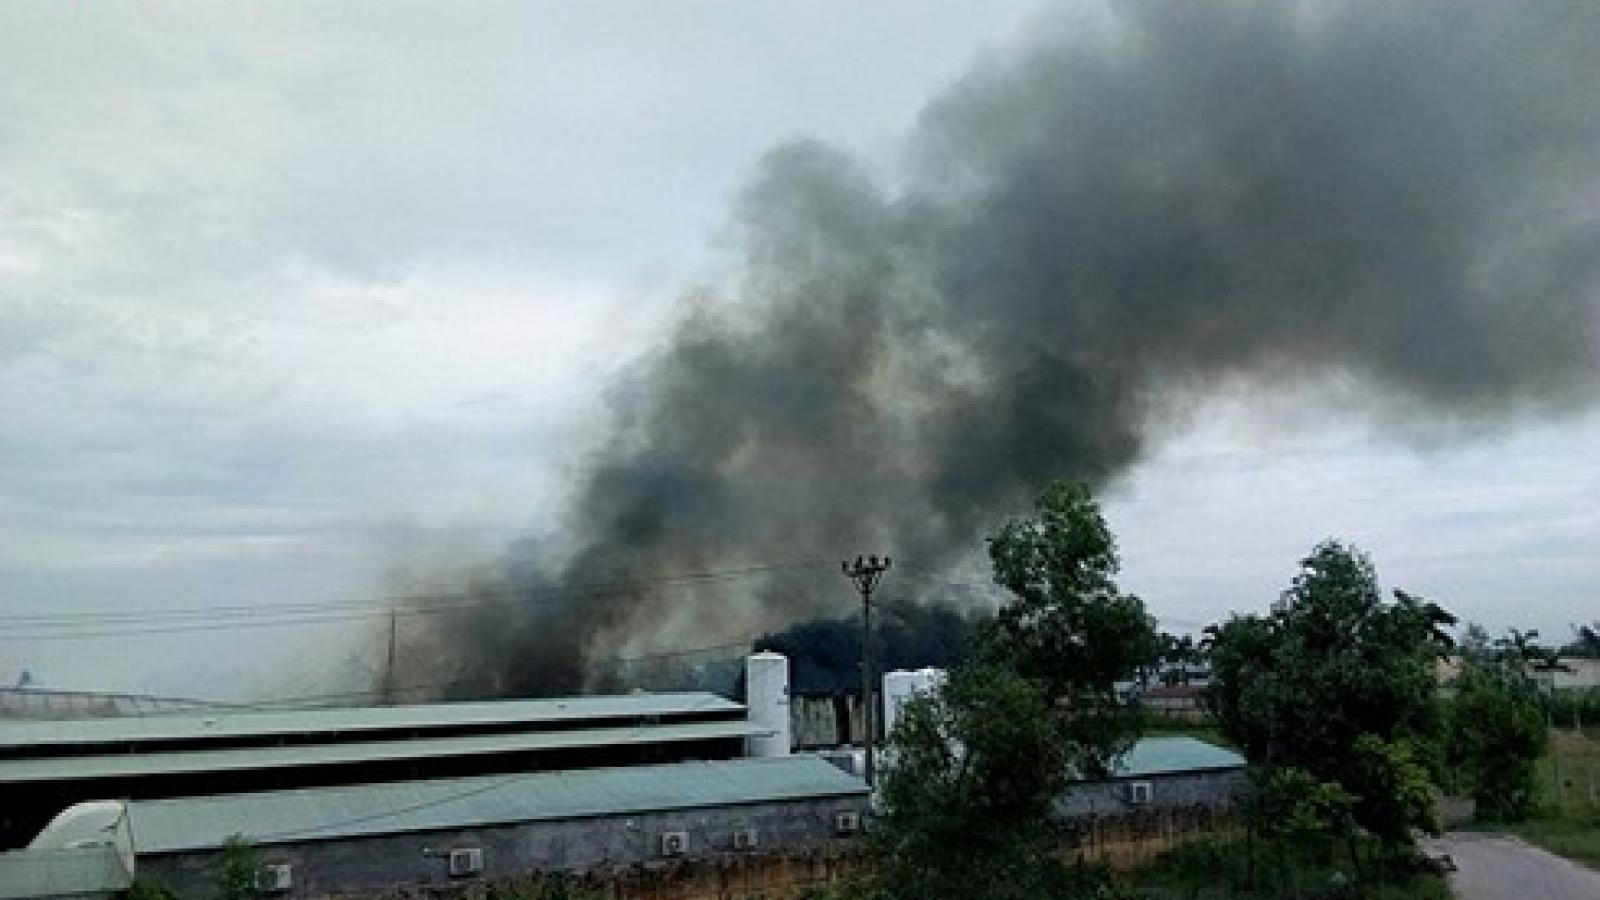 Fire destroys 3 workshops in Hai Phong